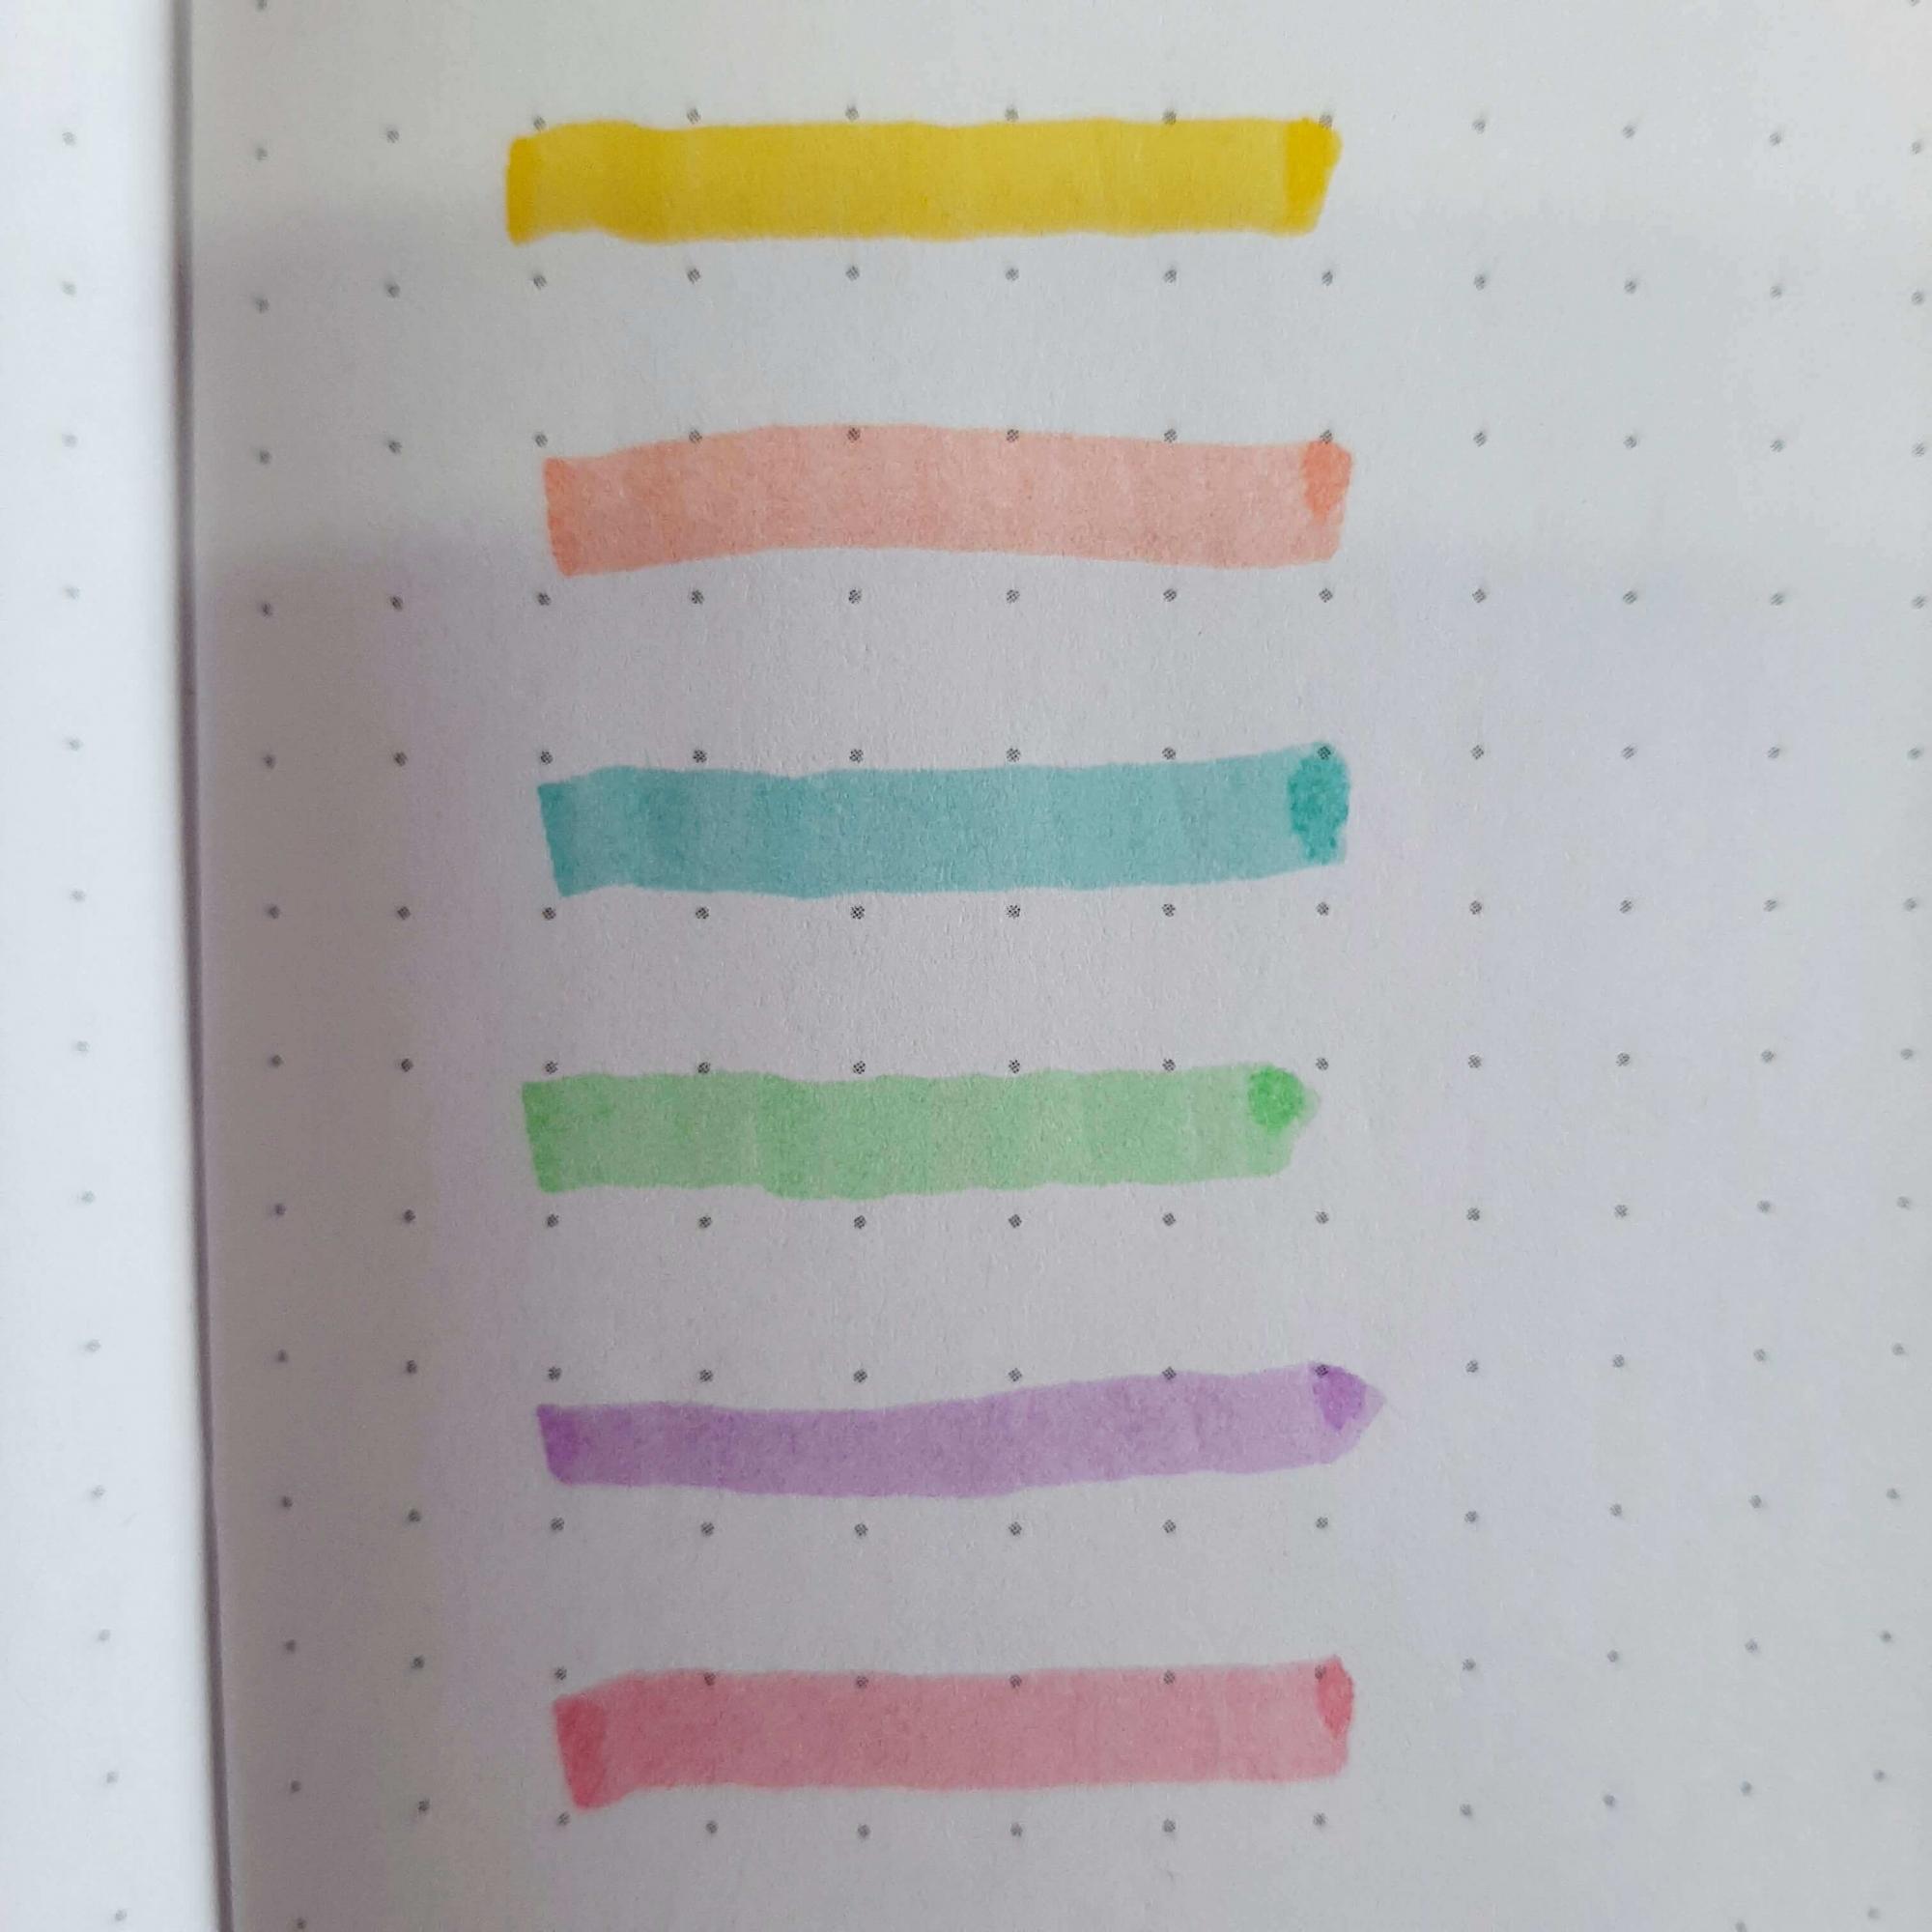 Mini Marca Texto Cis Lumini Pastel